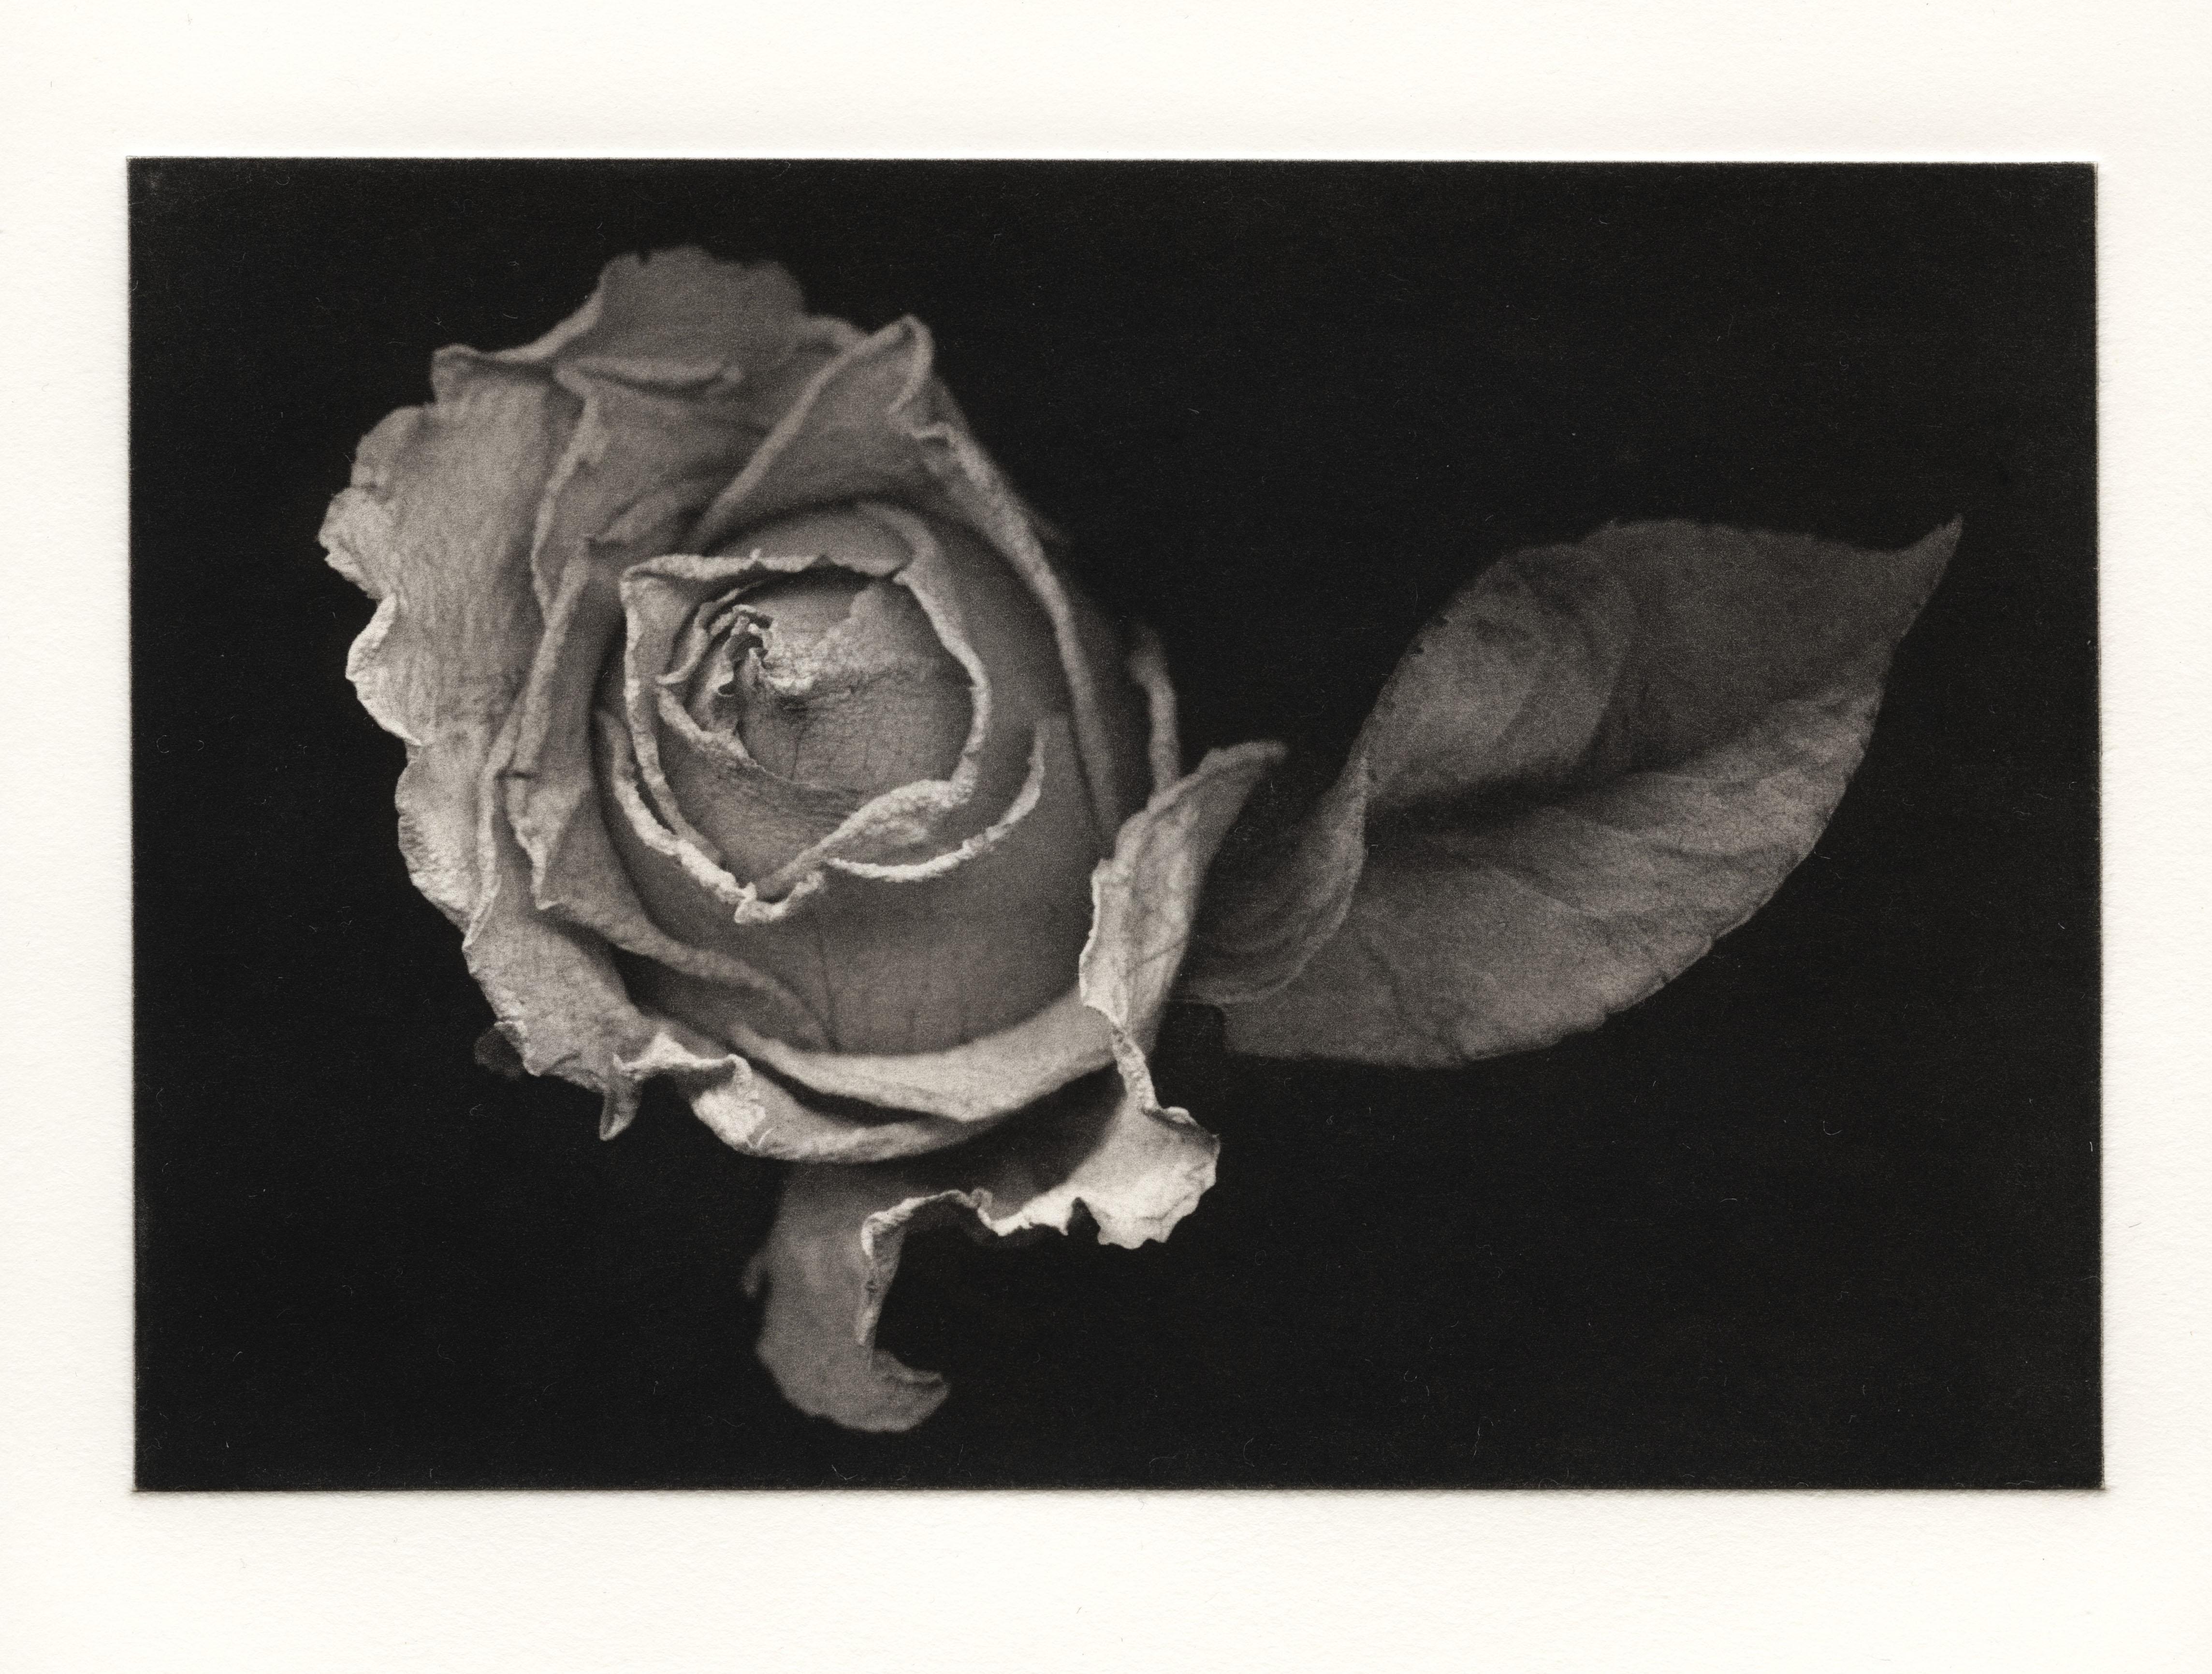 Jon Lybrook : Polymer Photogravure for More Photographic